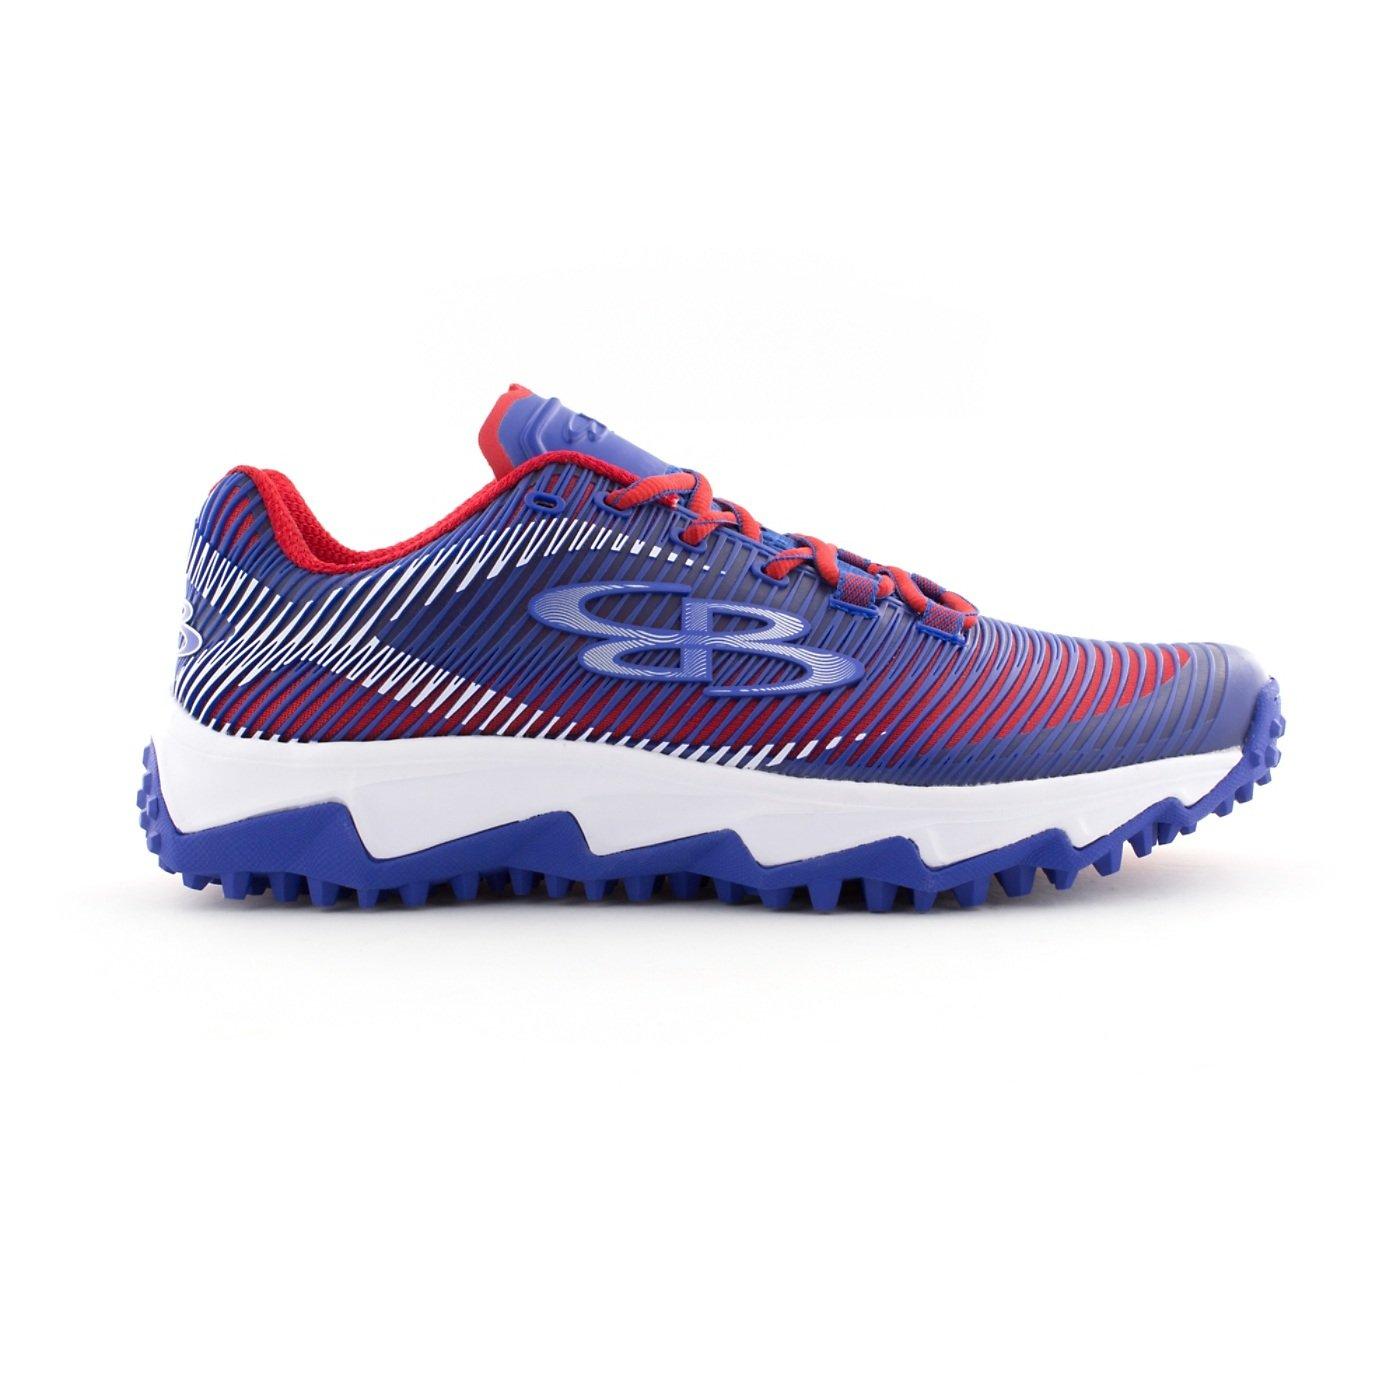 BoombahメンズAftershock DPS Turf Shoes – 18カラーオプション – 複数のサイズÉ B0767QFBQS 10|ロイヤル/レッド ロイヤル/レッド 10